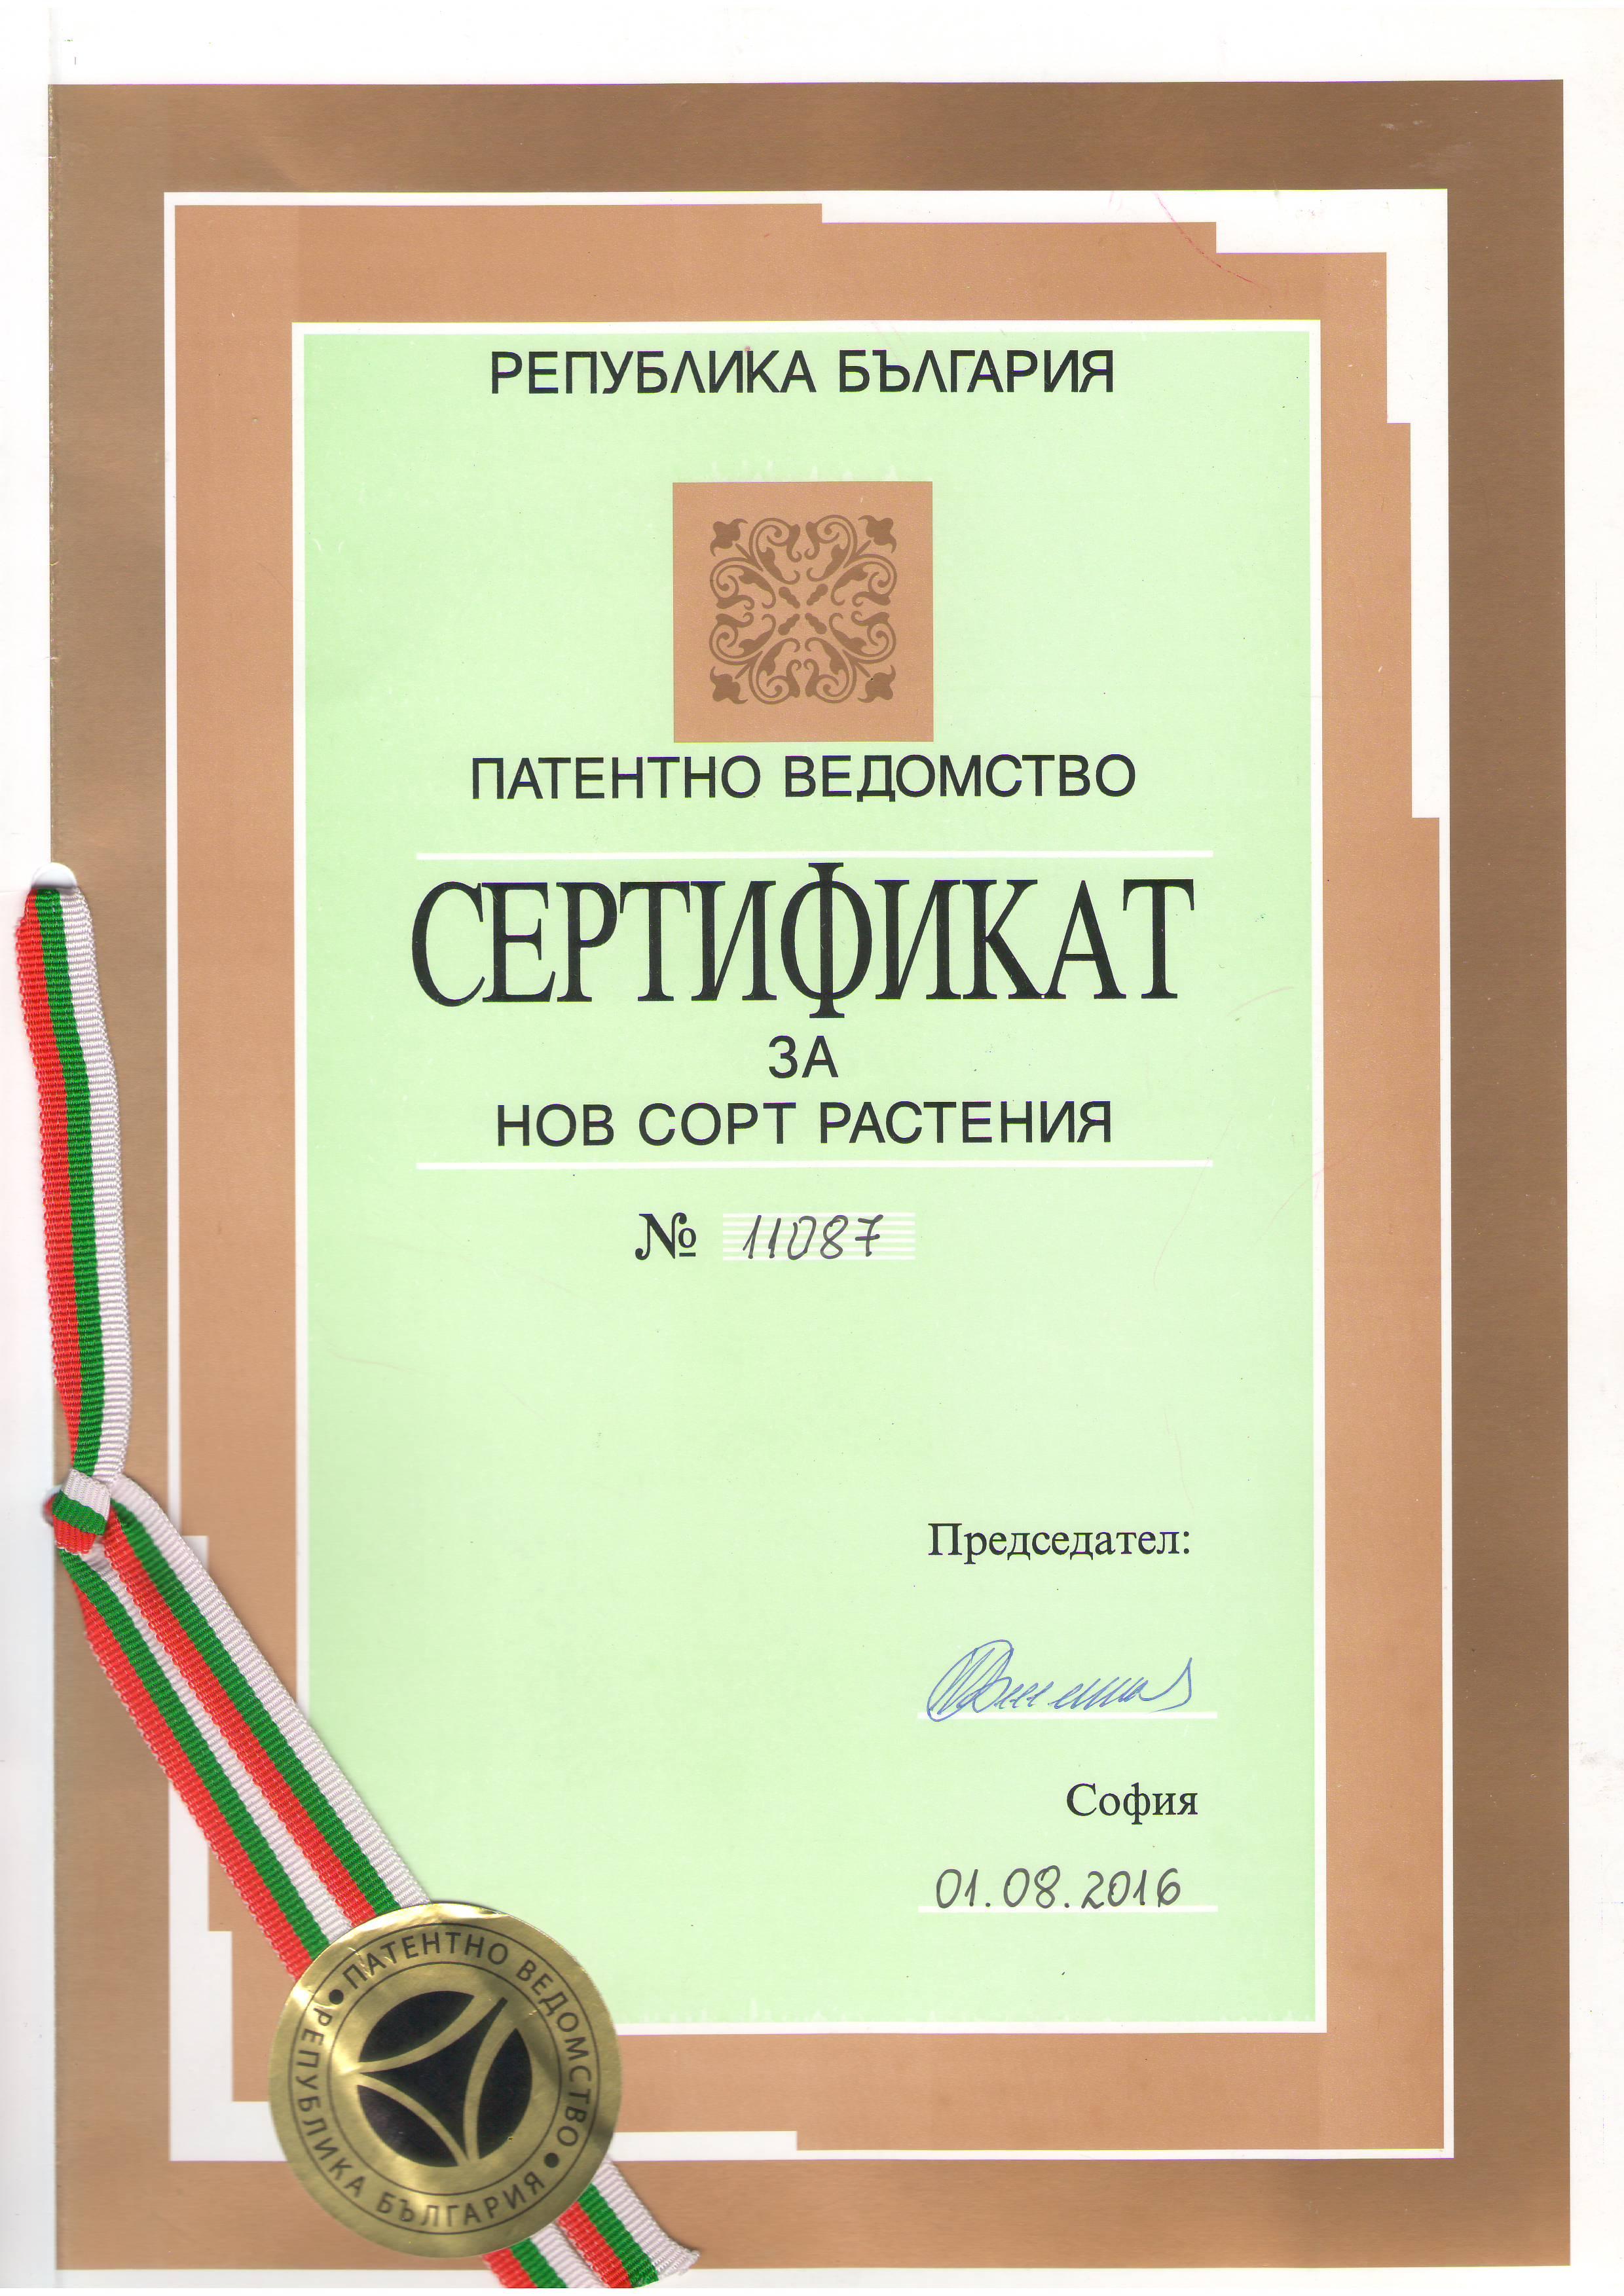 Сертификат за нов сорт пауловния - BELLISSIA